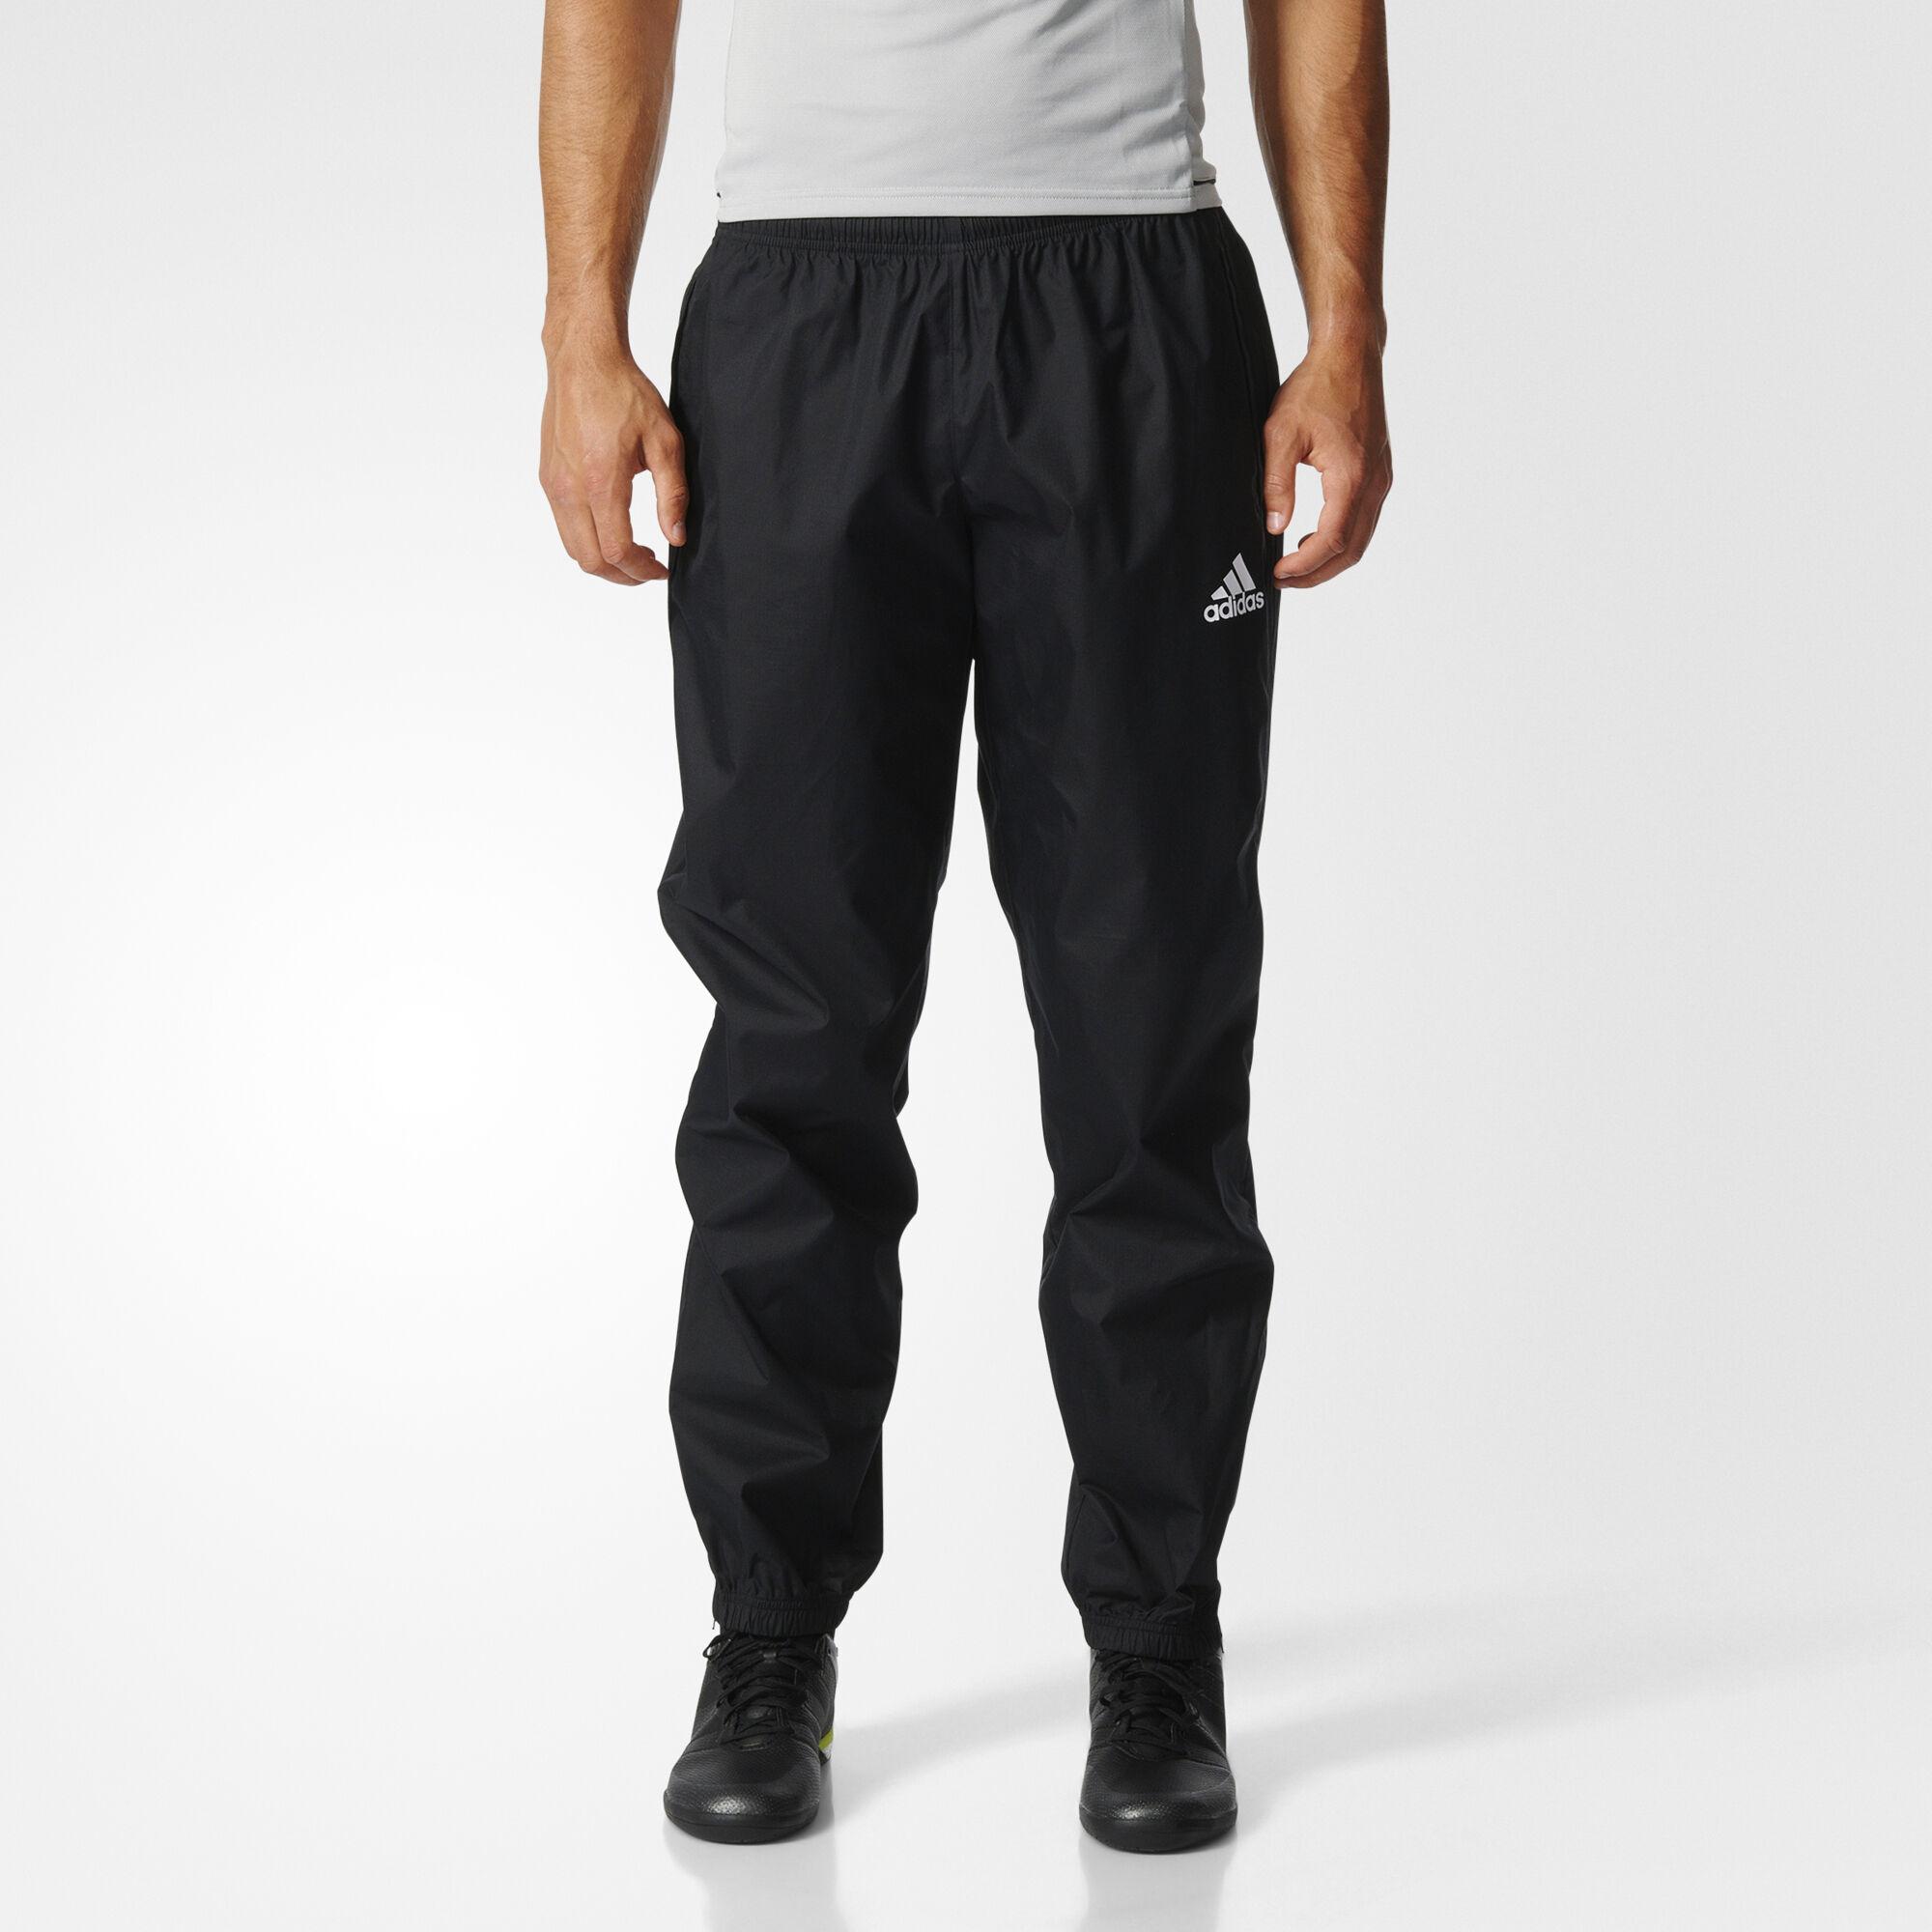 Adidas Neo Male